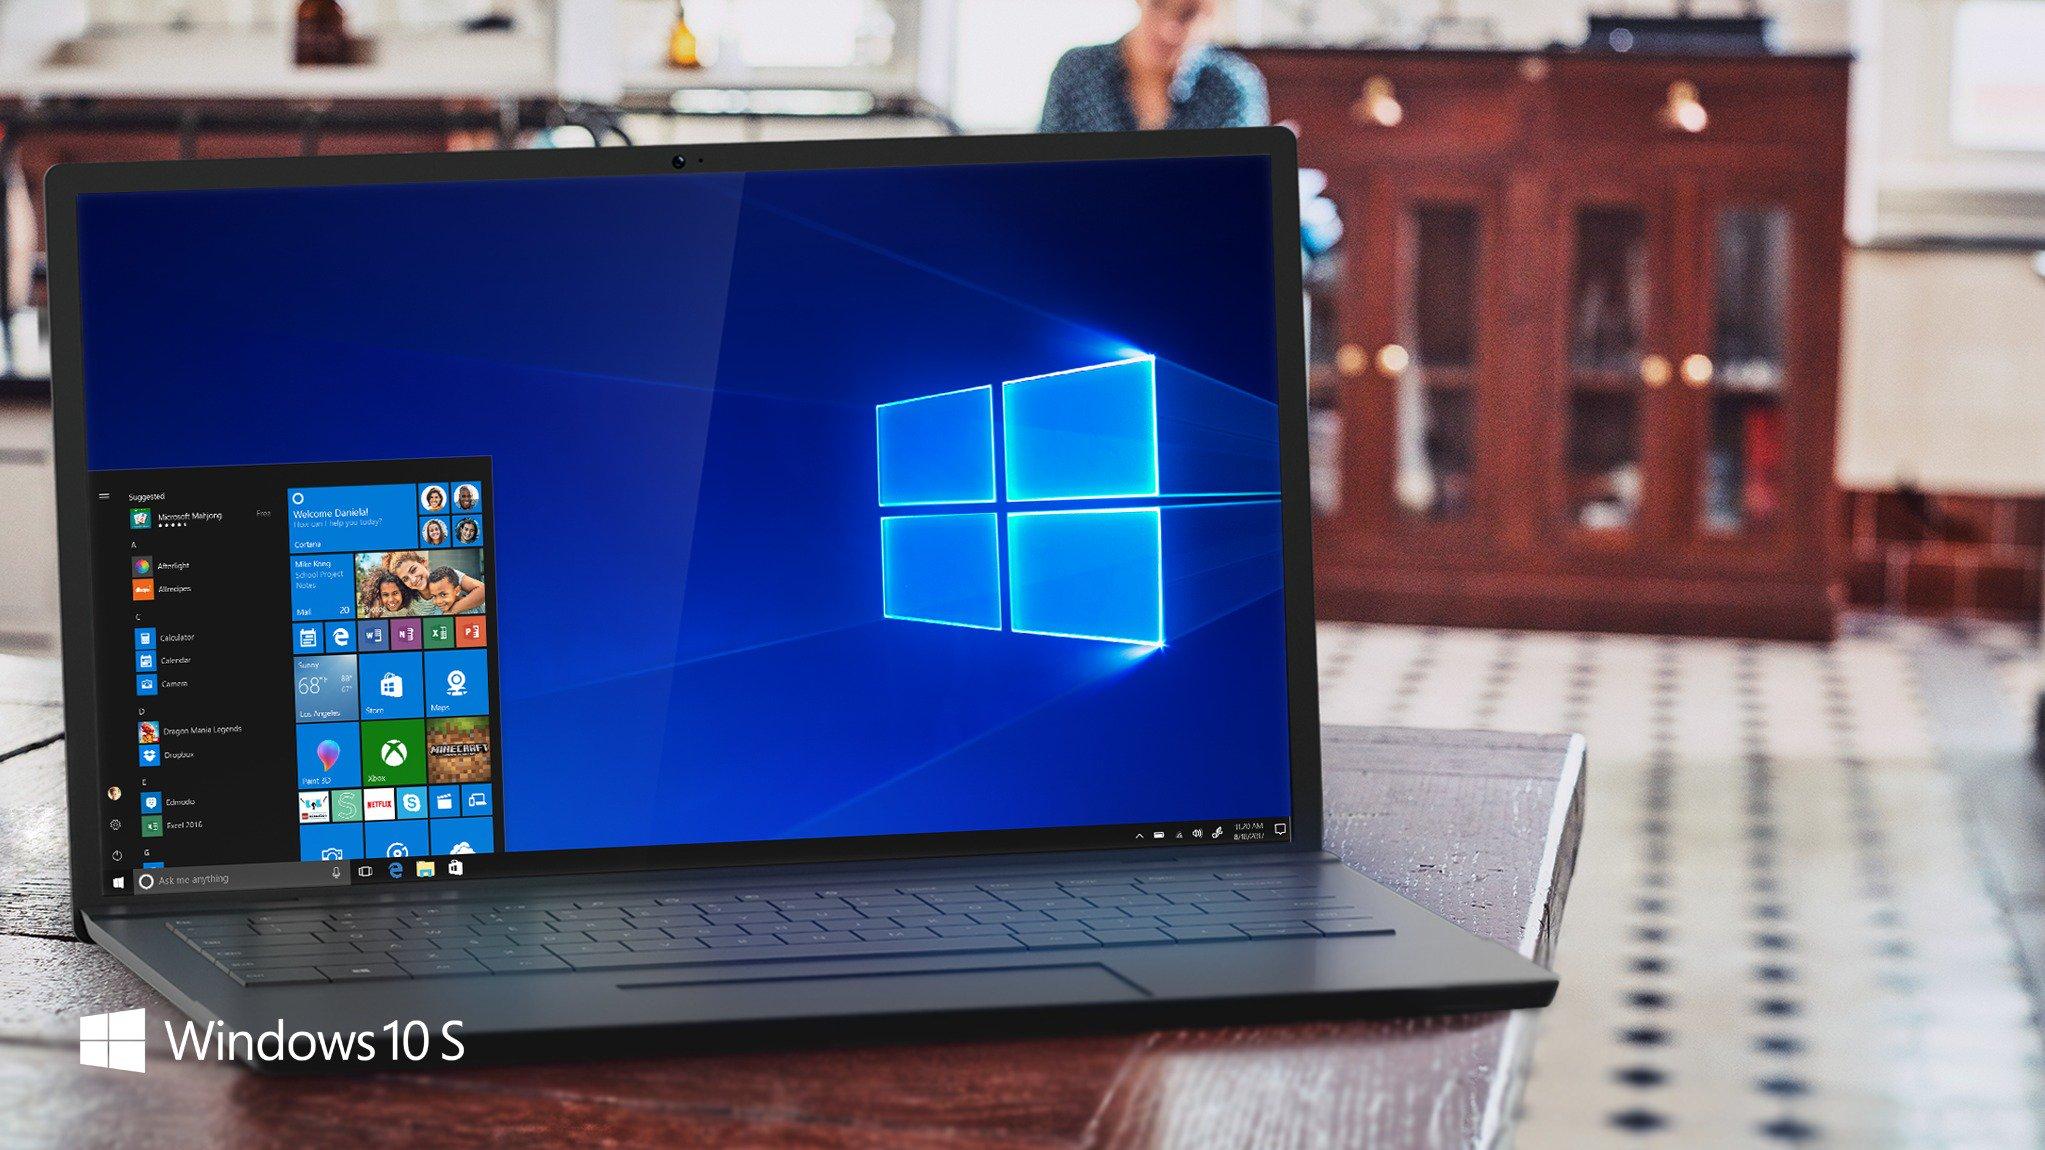 Computer running Windows 10 S